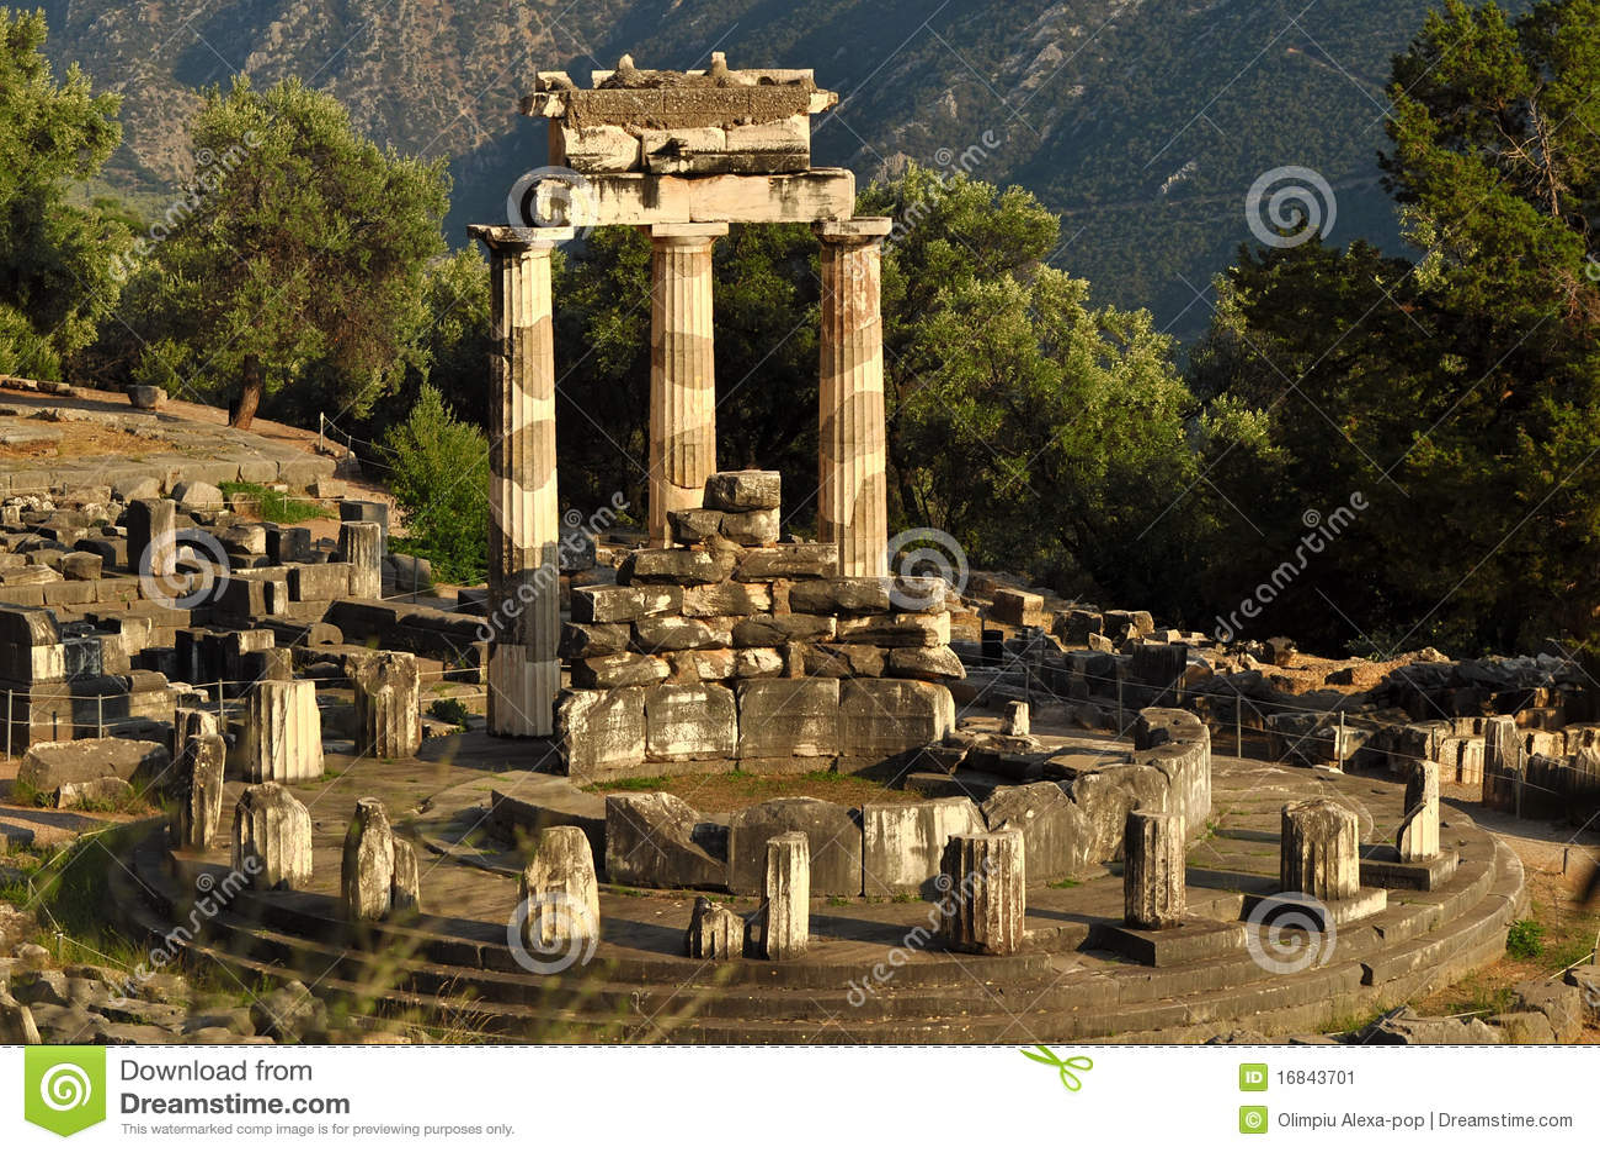 The Tholos At The Sanctuary Of Athena Pronaia Stock Image ...